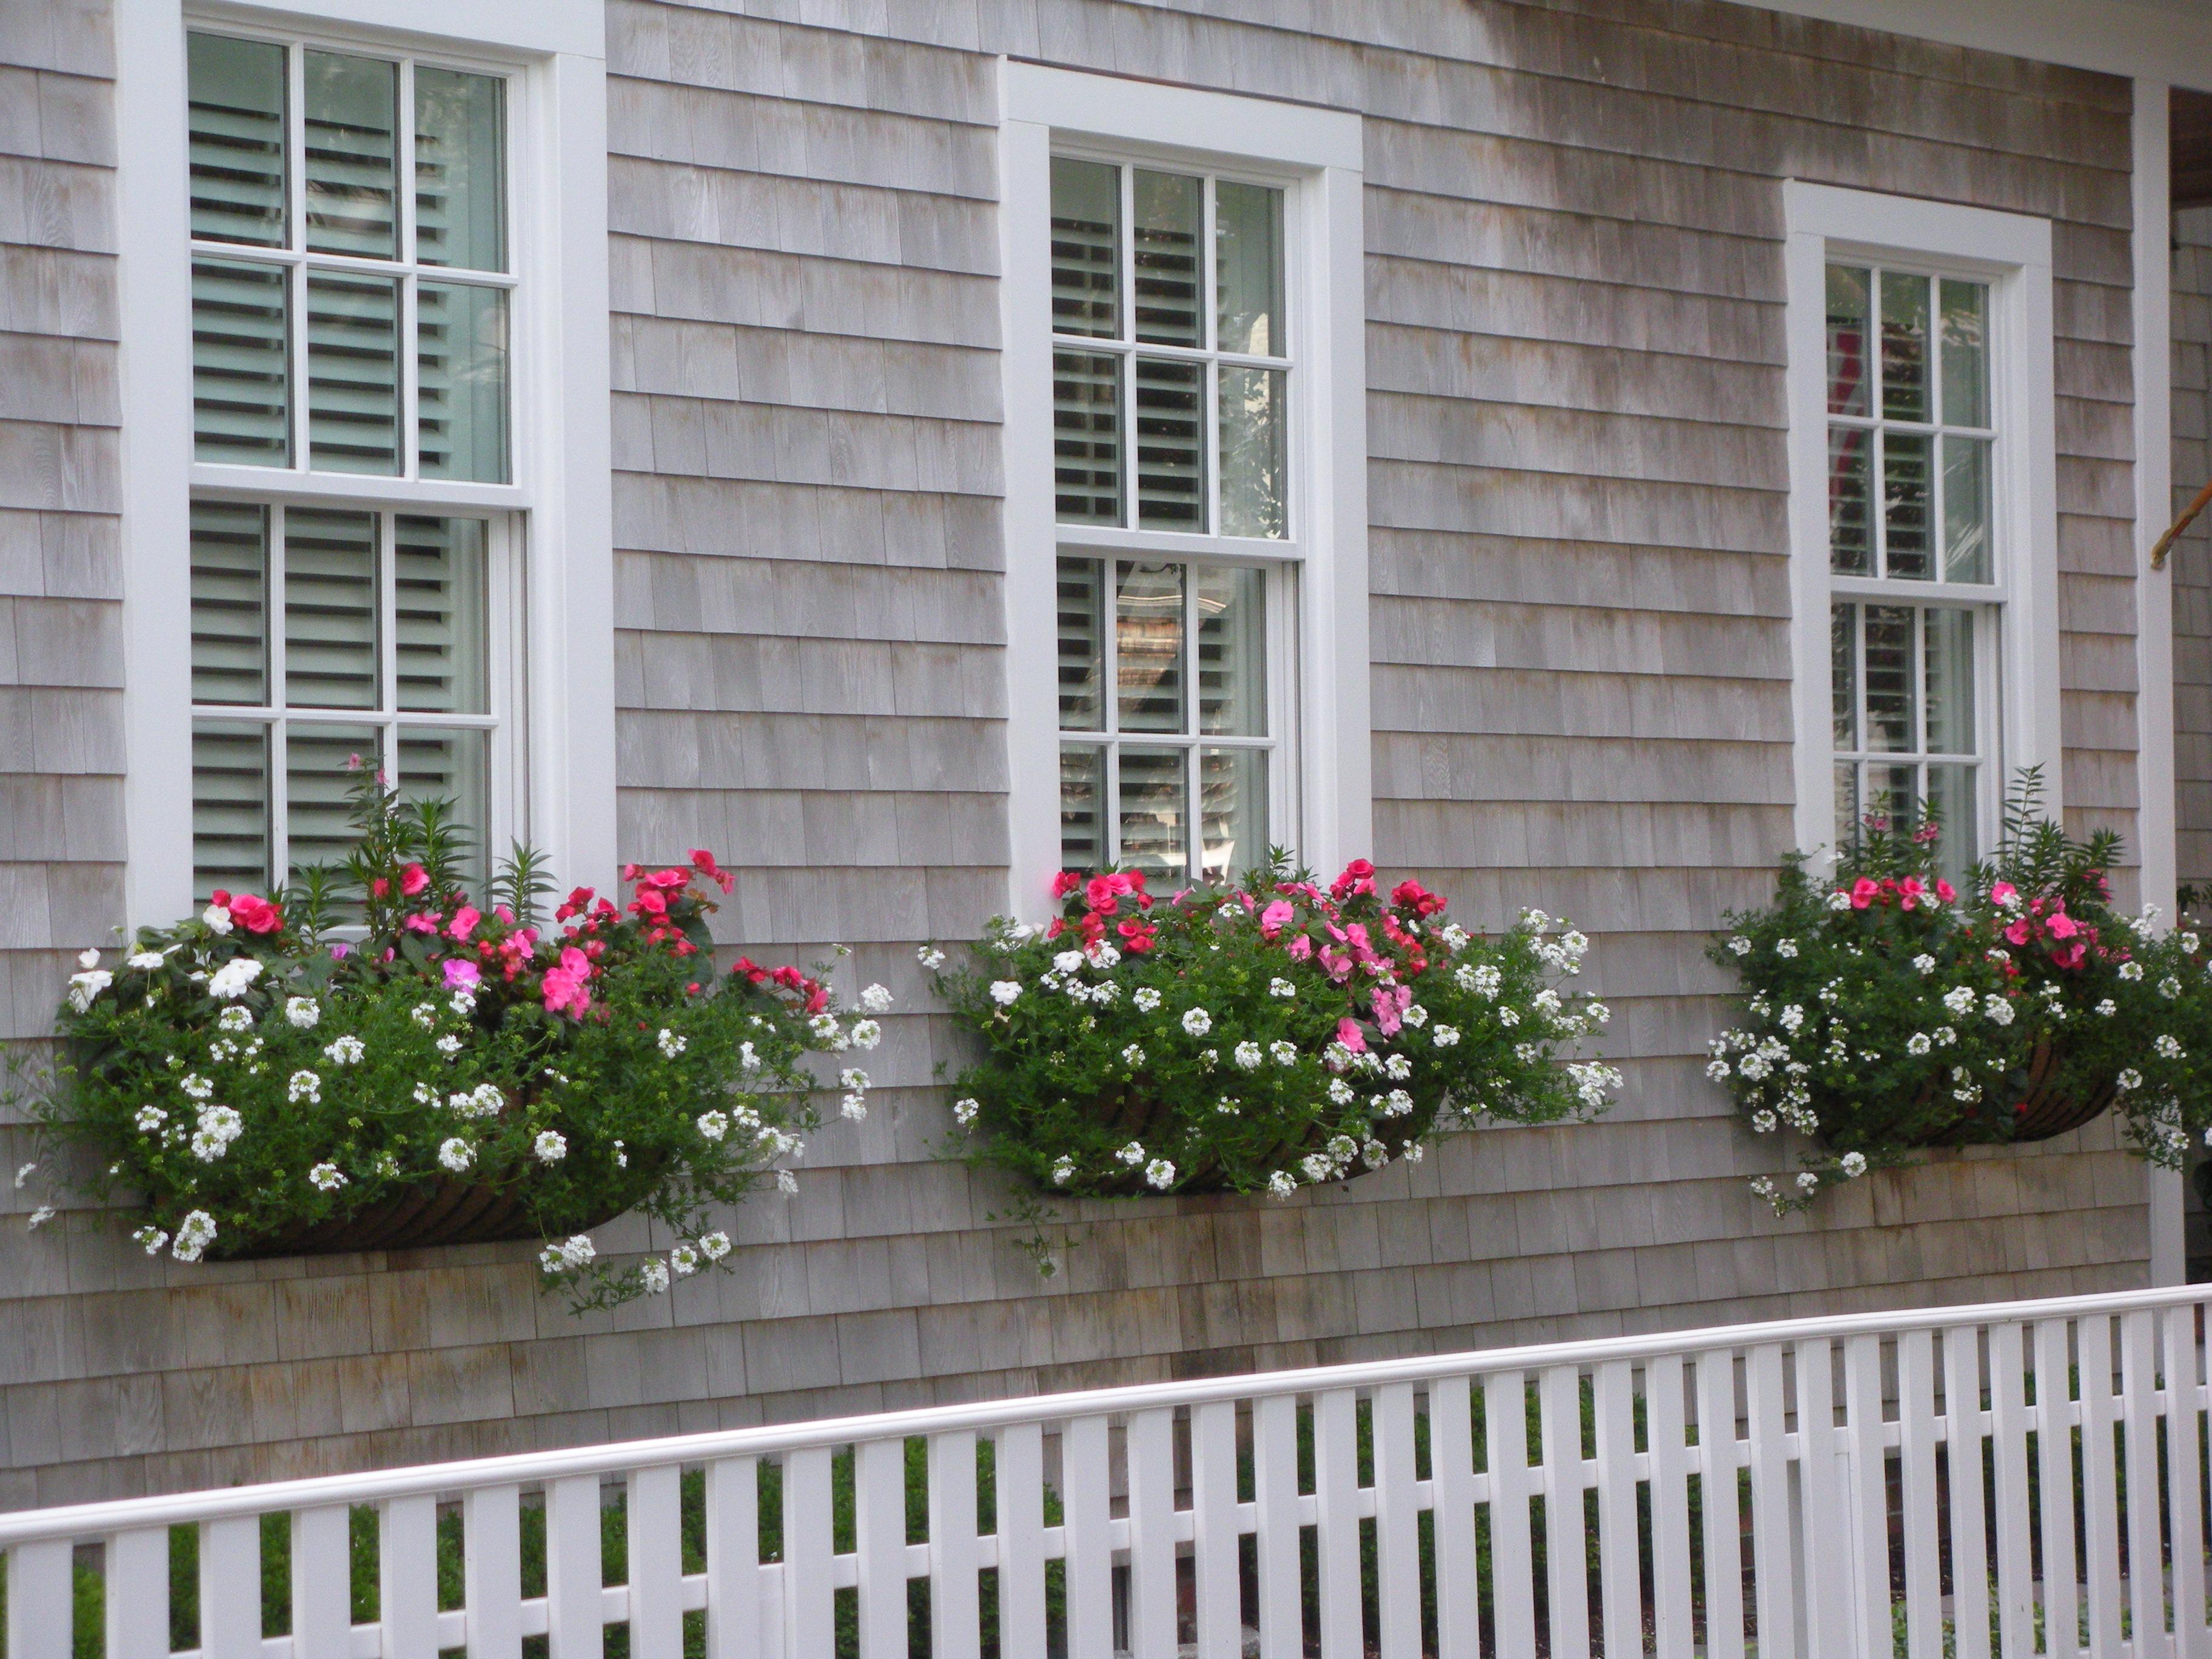 Window Boxes in Edgartown